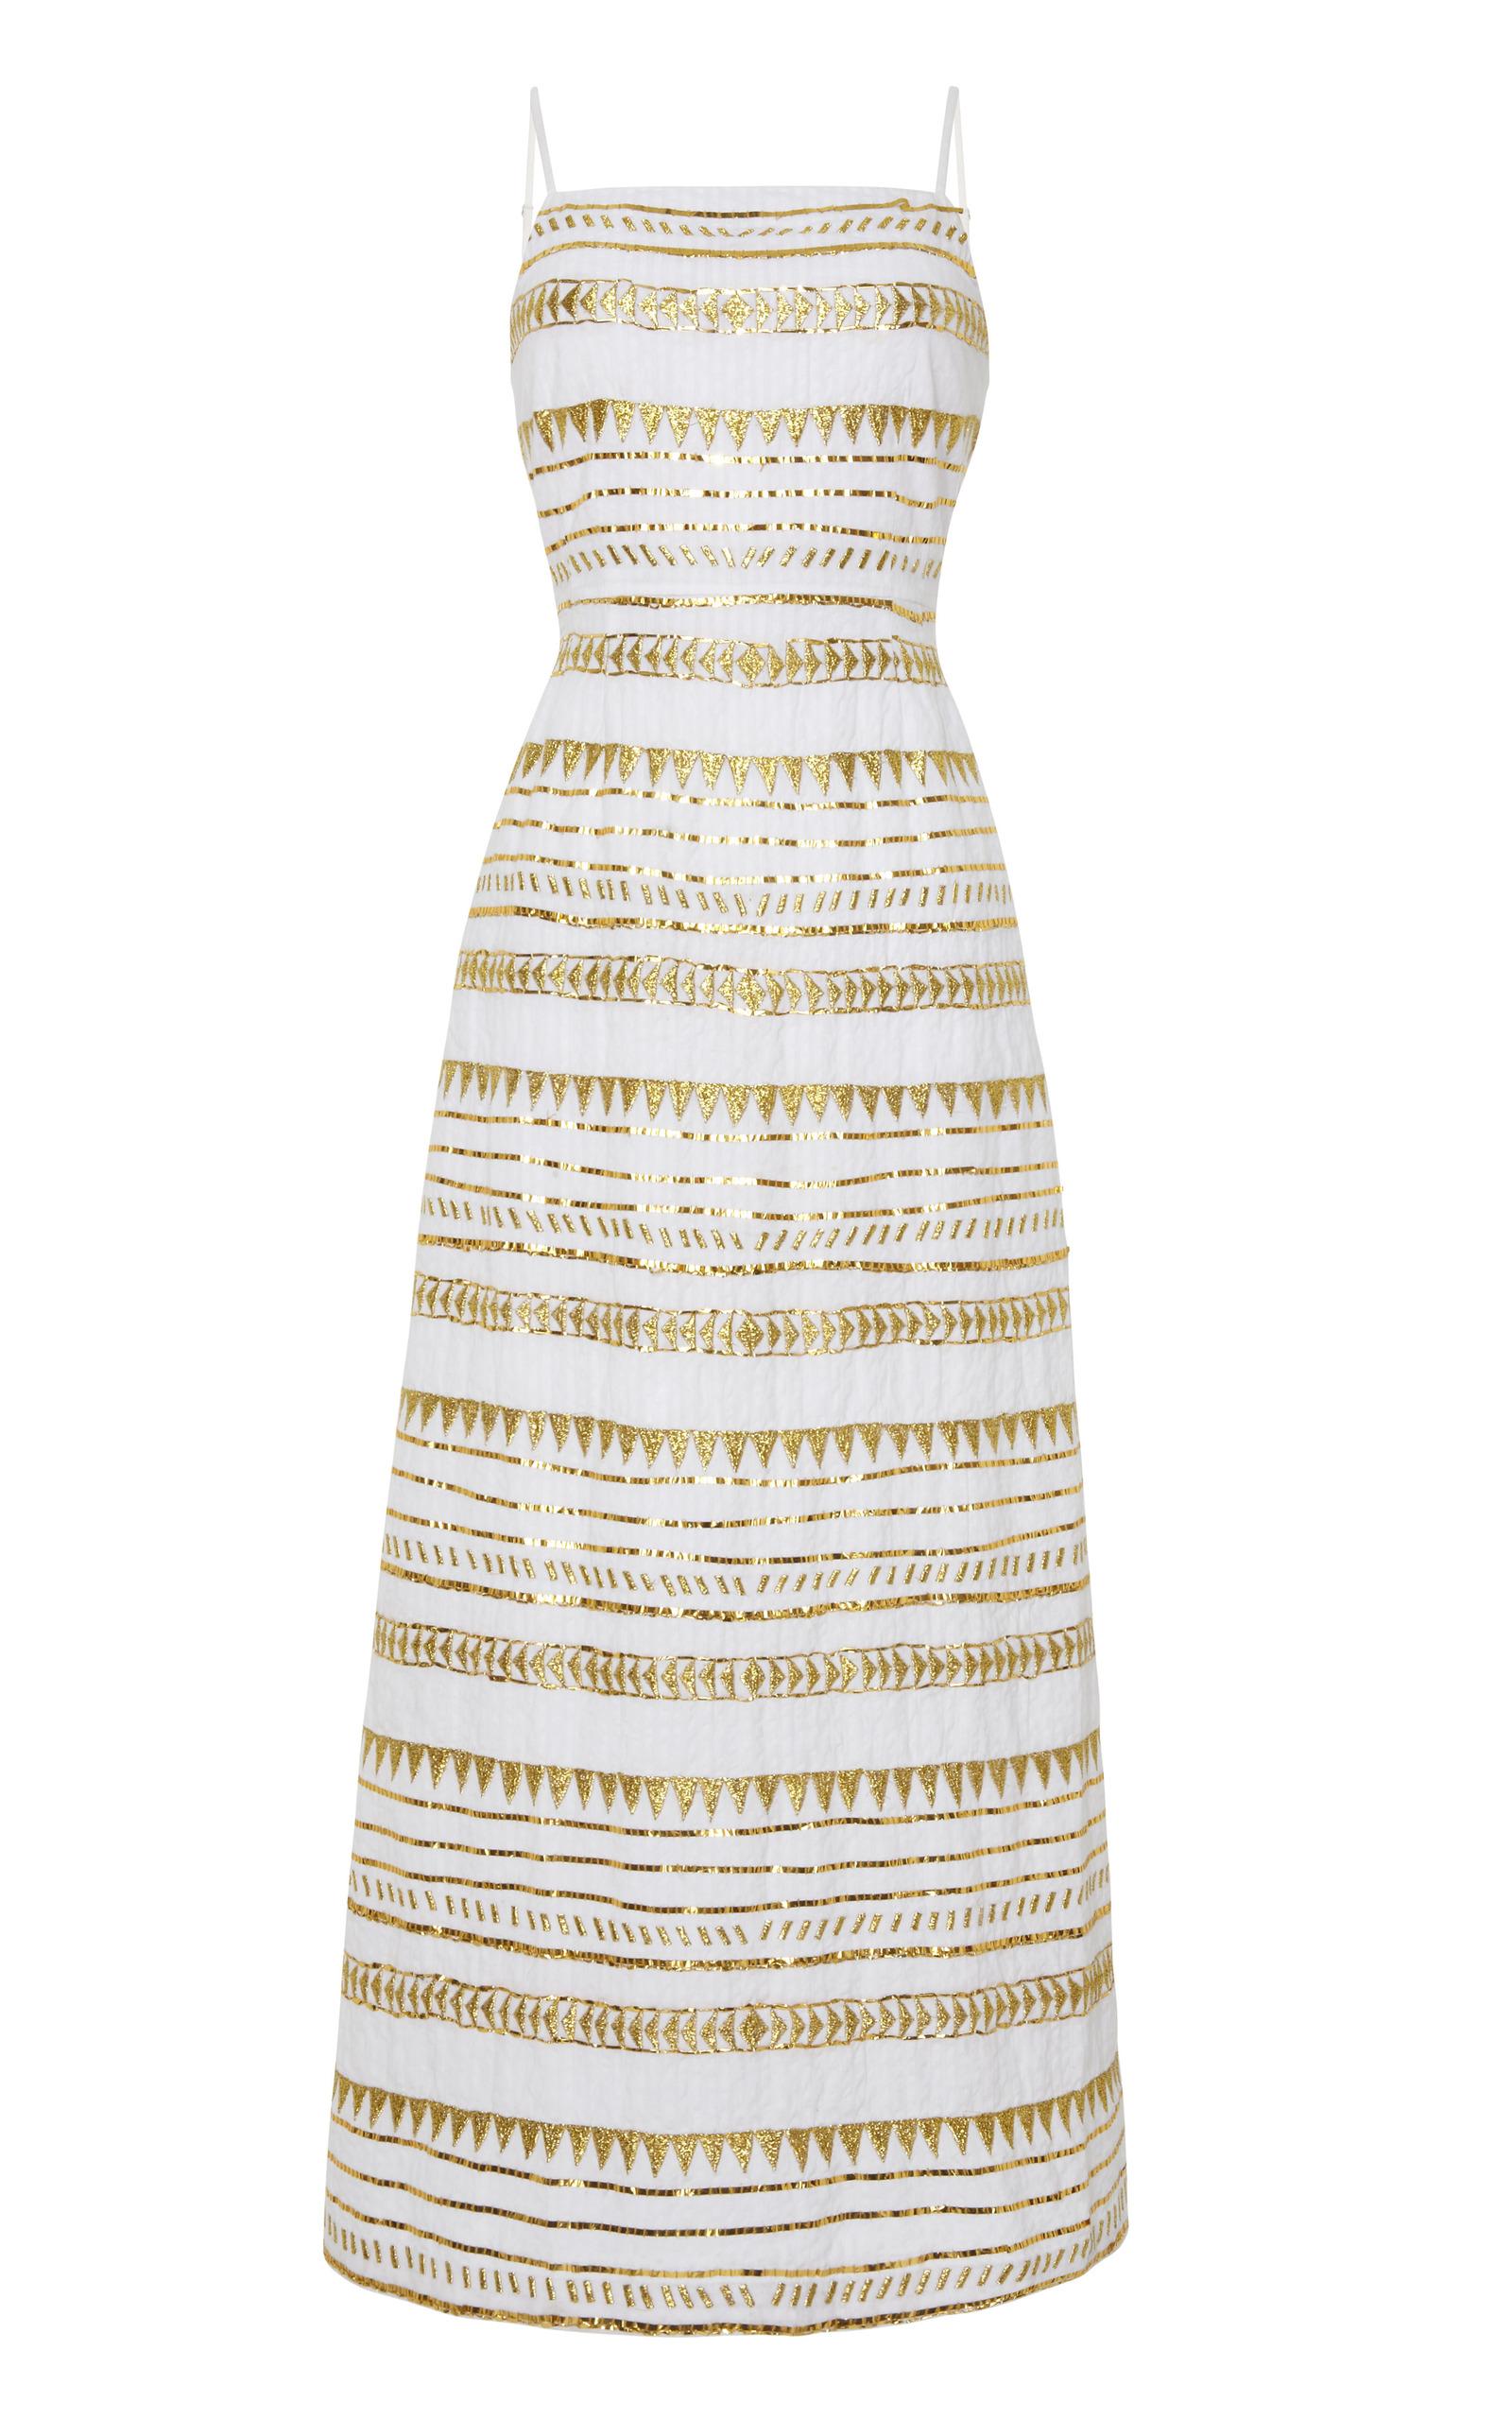 93851db7ed1e Gold Embroidery Maxi Dress by Suno